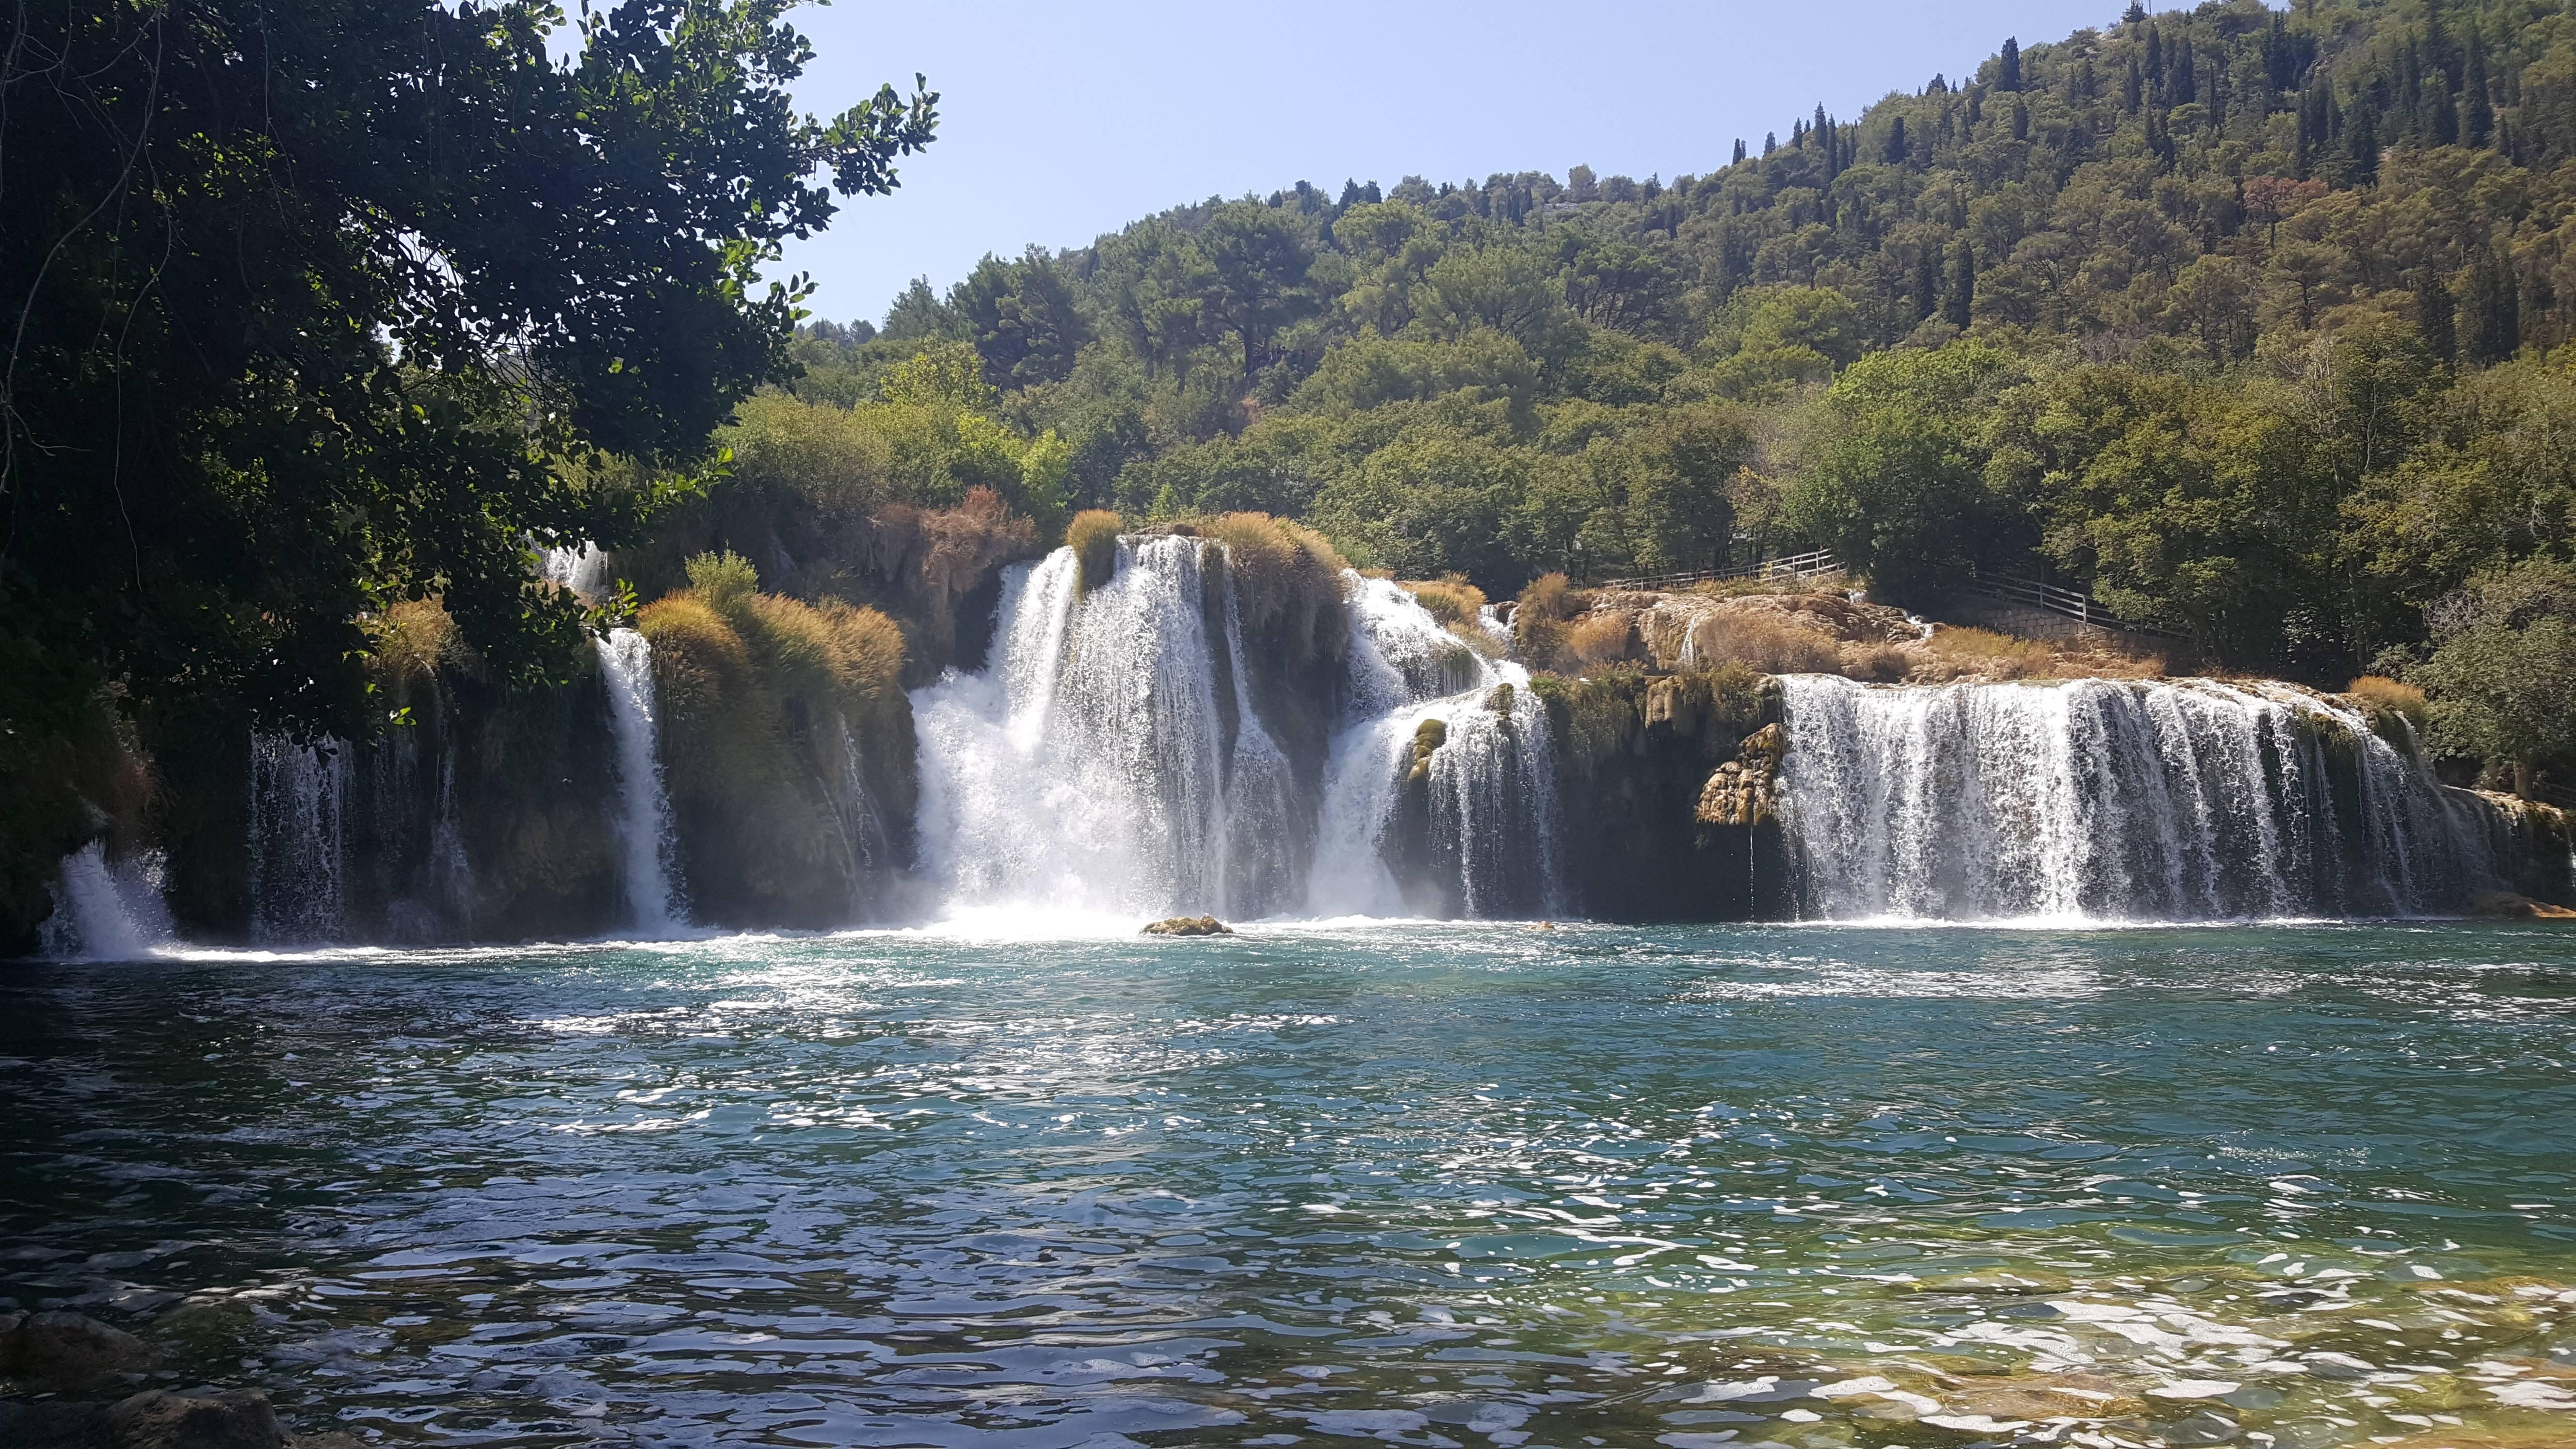 Photo 3: Cascades, Ballades, Baignades sous le soleil croate